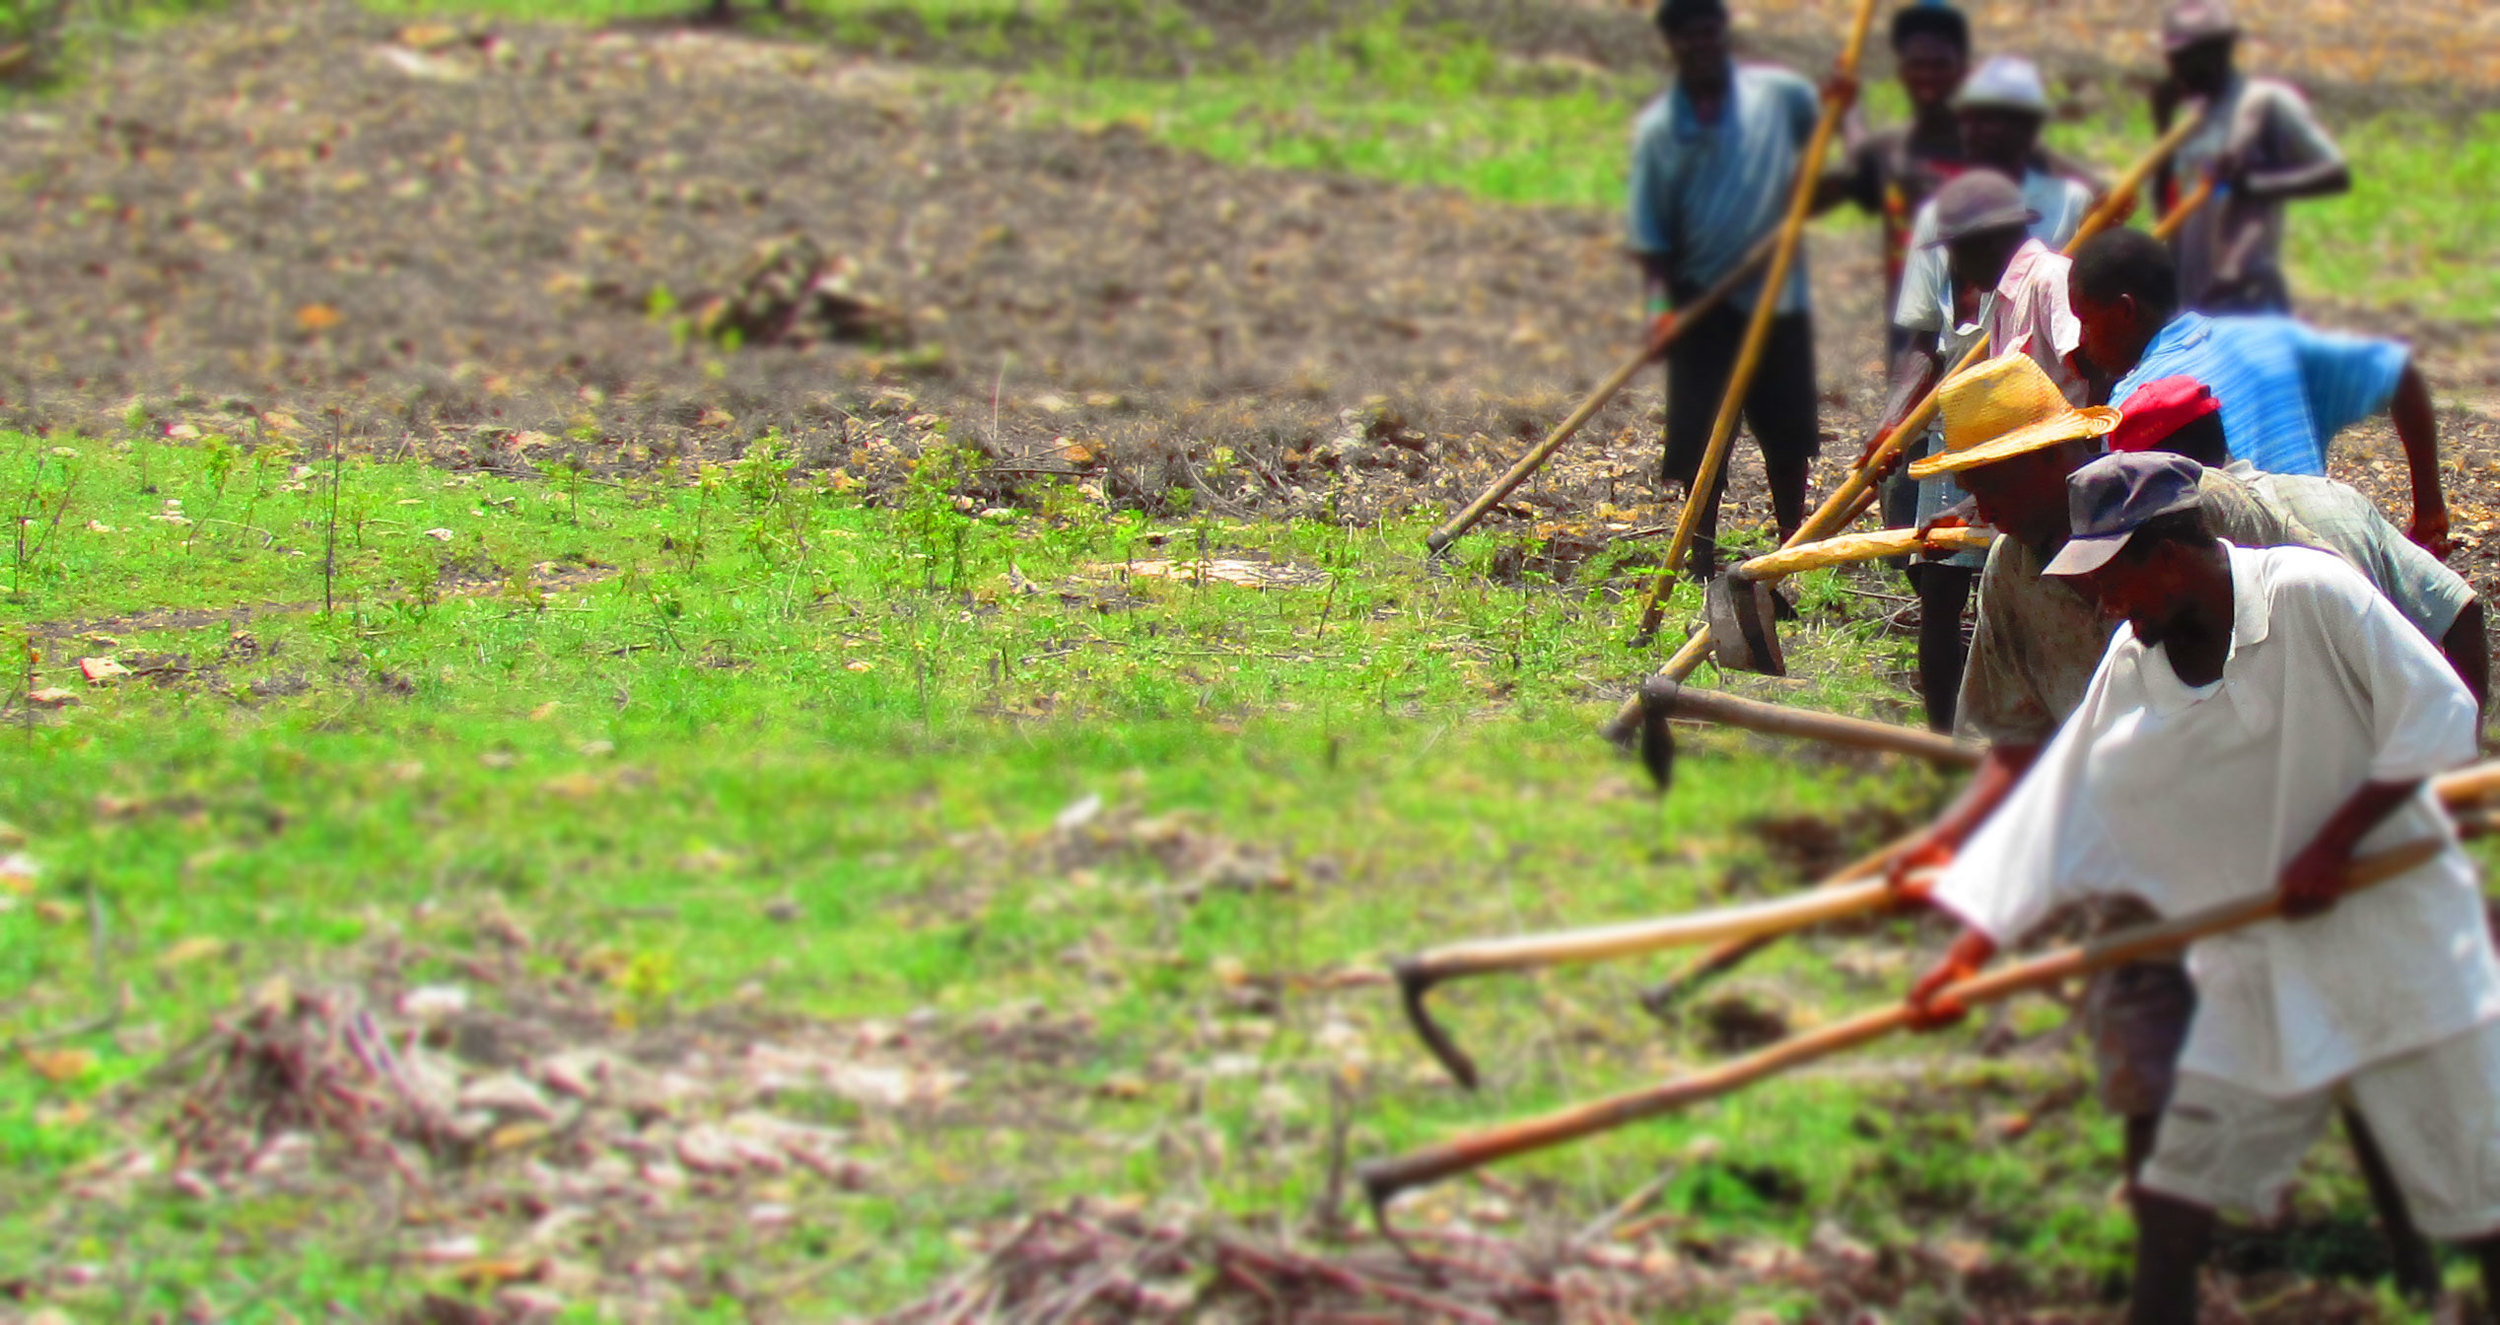 Preparation of parcels of land for plantin